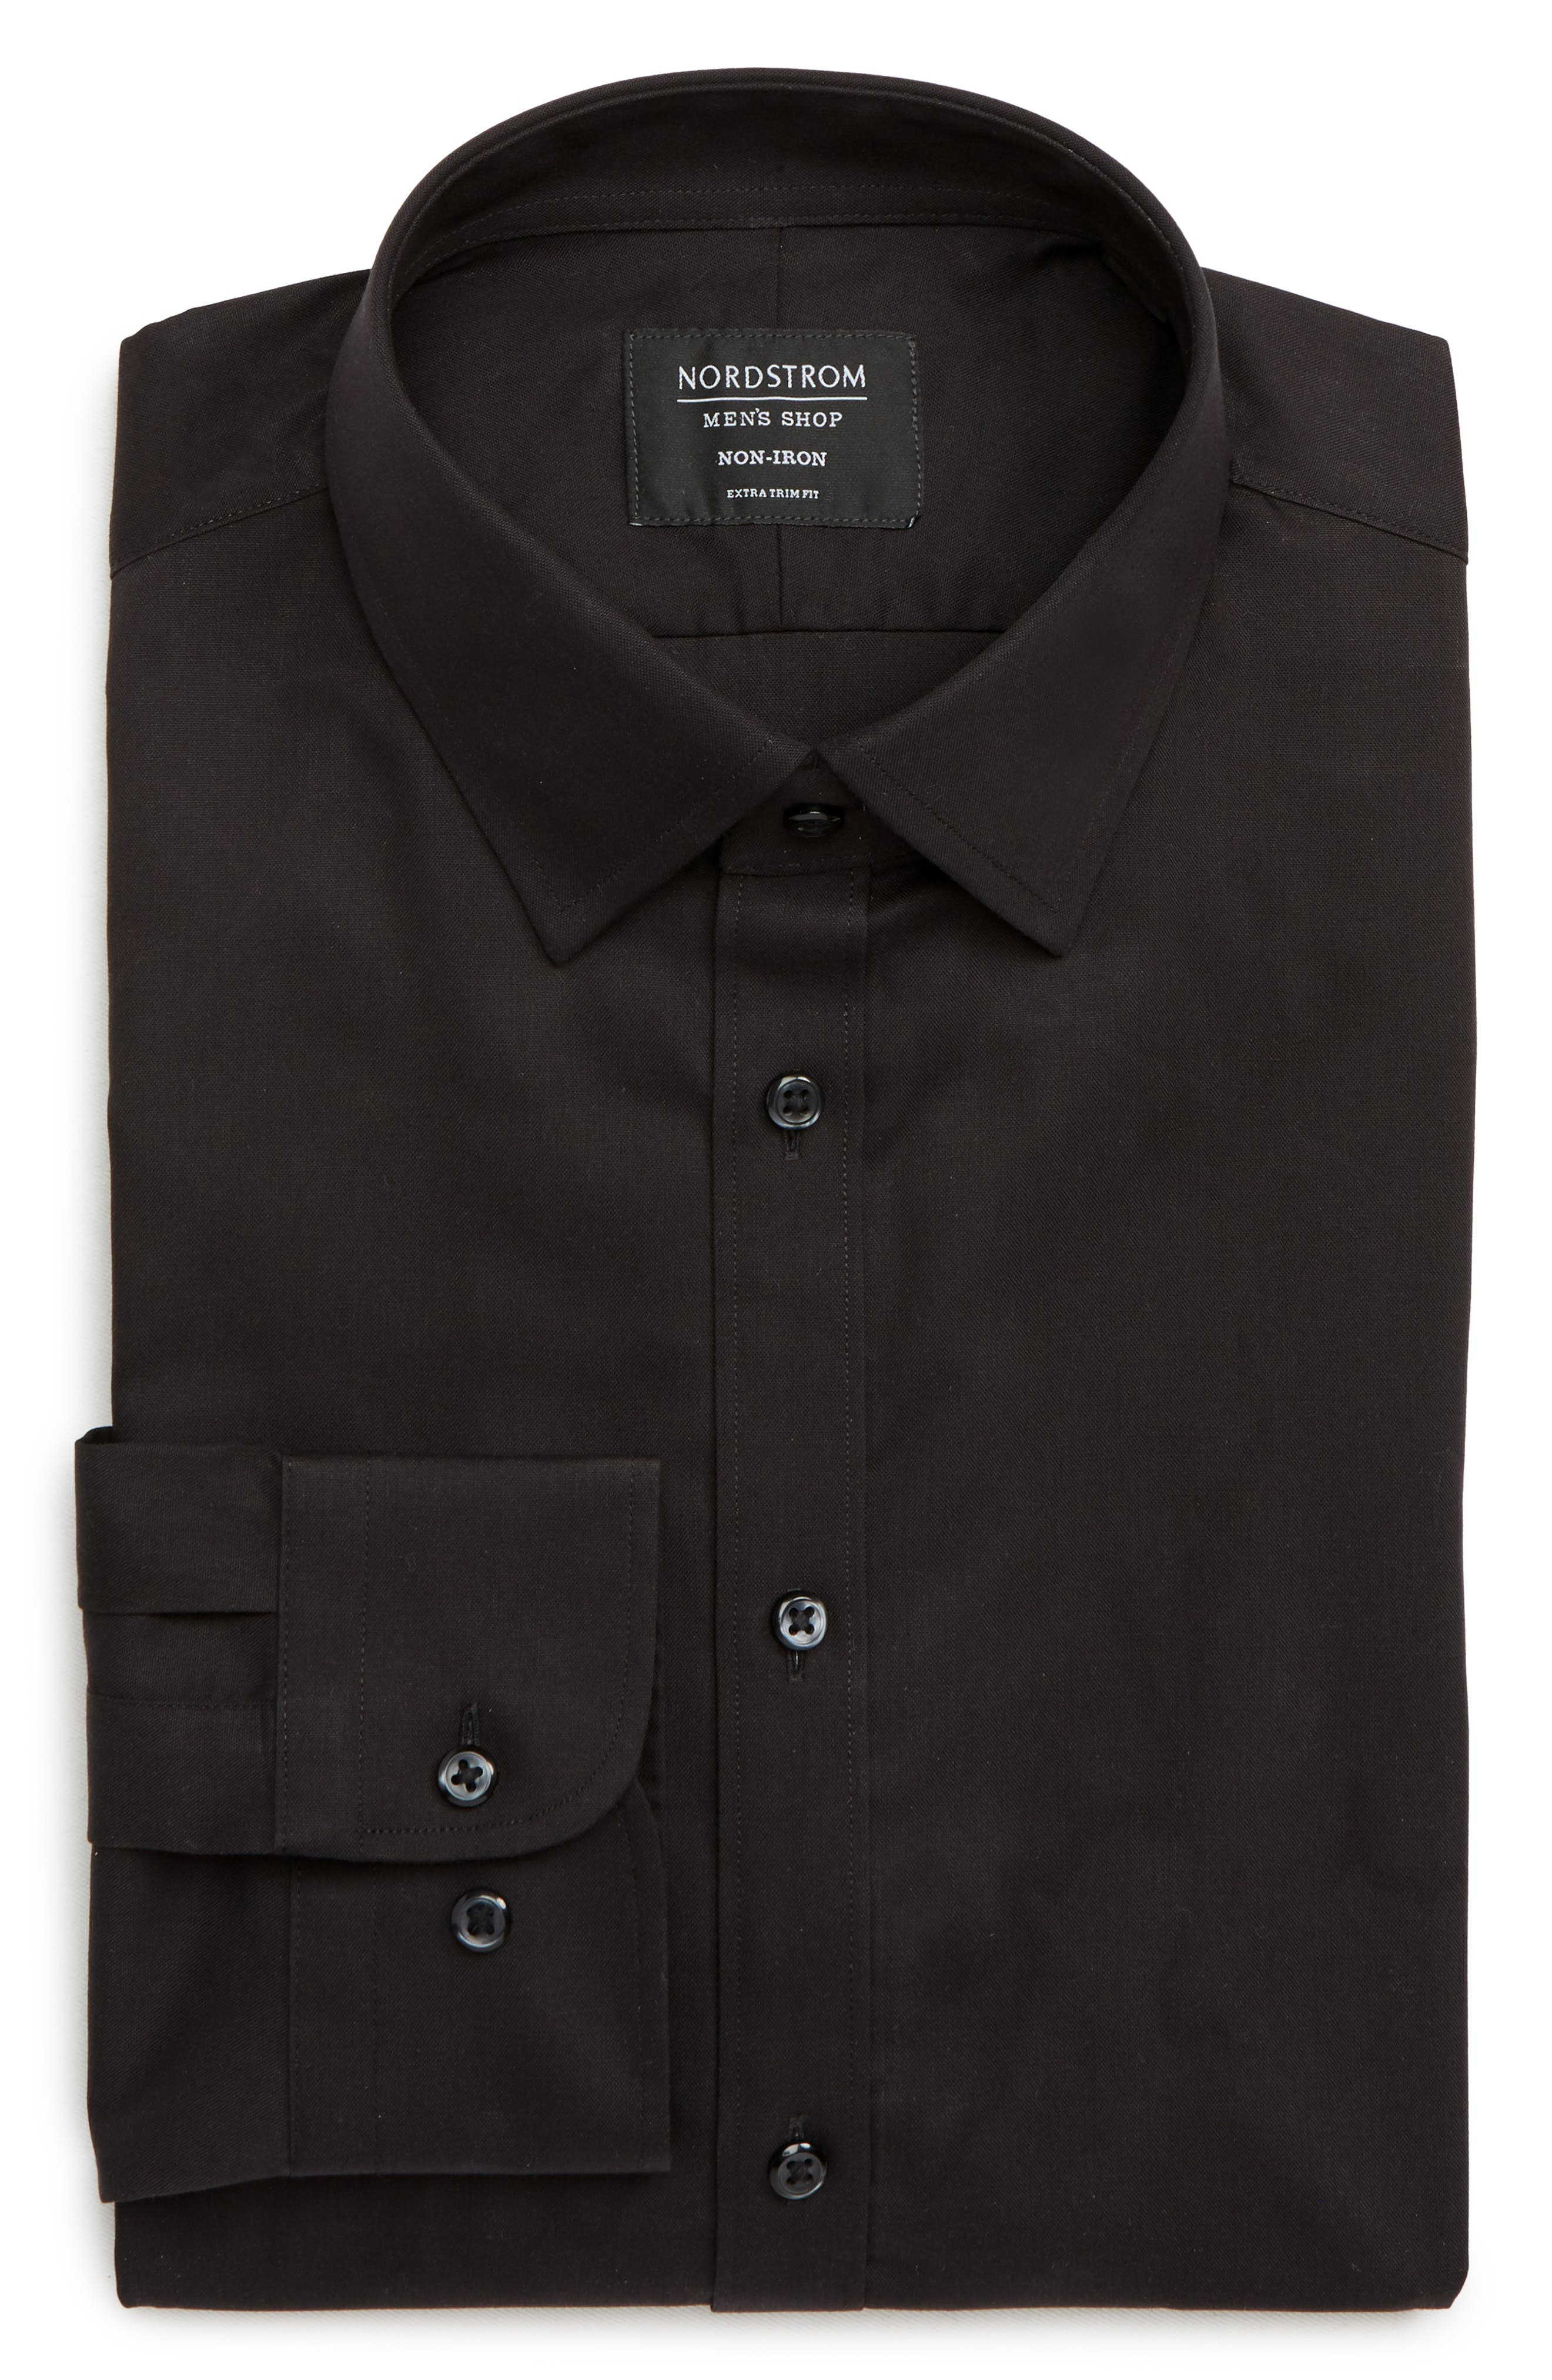 NORDSTROM MEN'S SHOP,                             Extra Trim Fit Non-Iron Solid Dress Shirt,                             Alternate thumbnail 5, color,                             BLACK ROCK